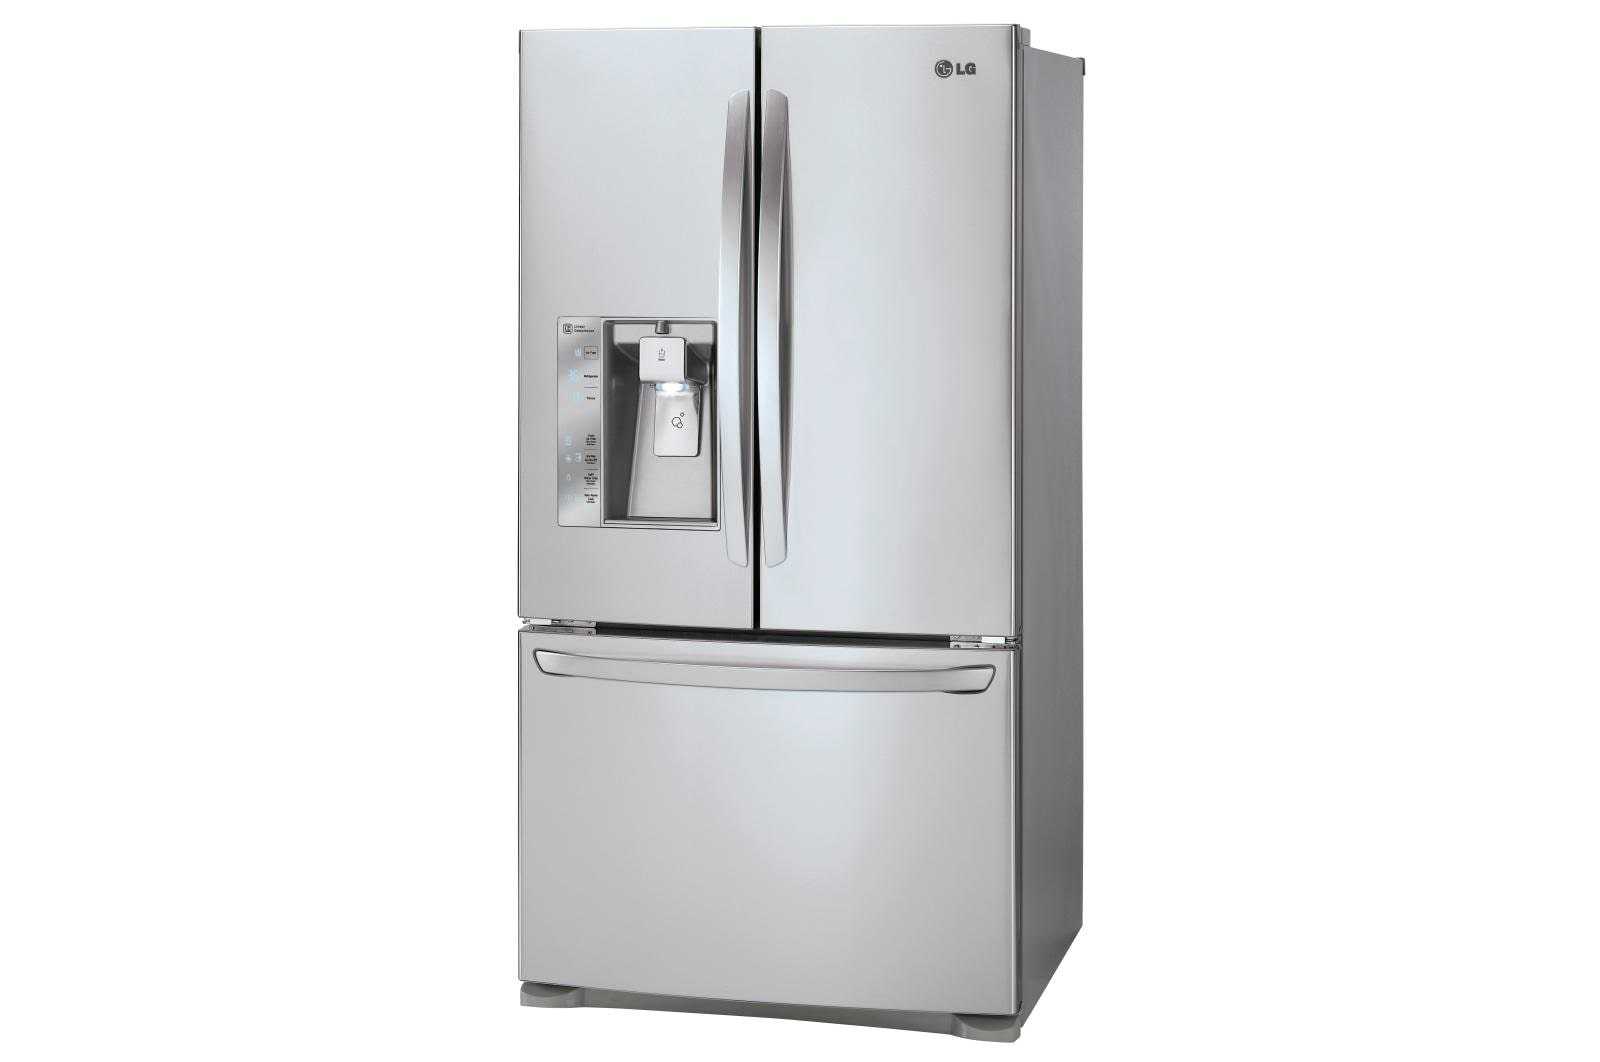 Manual For Lg Refrigerator Lfxc24726s Wiring Diagram